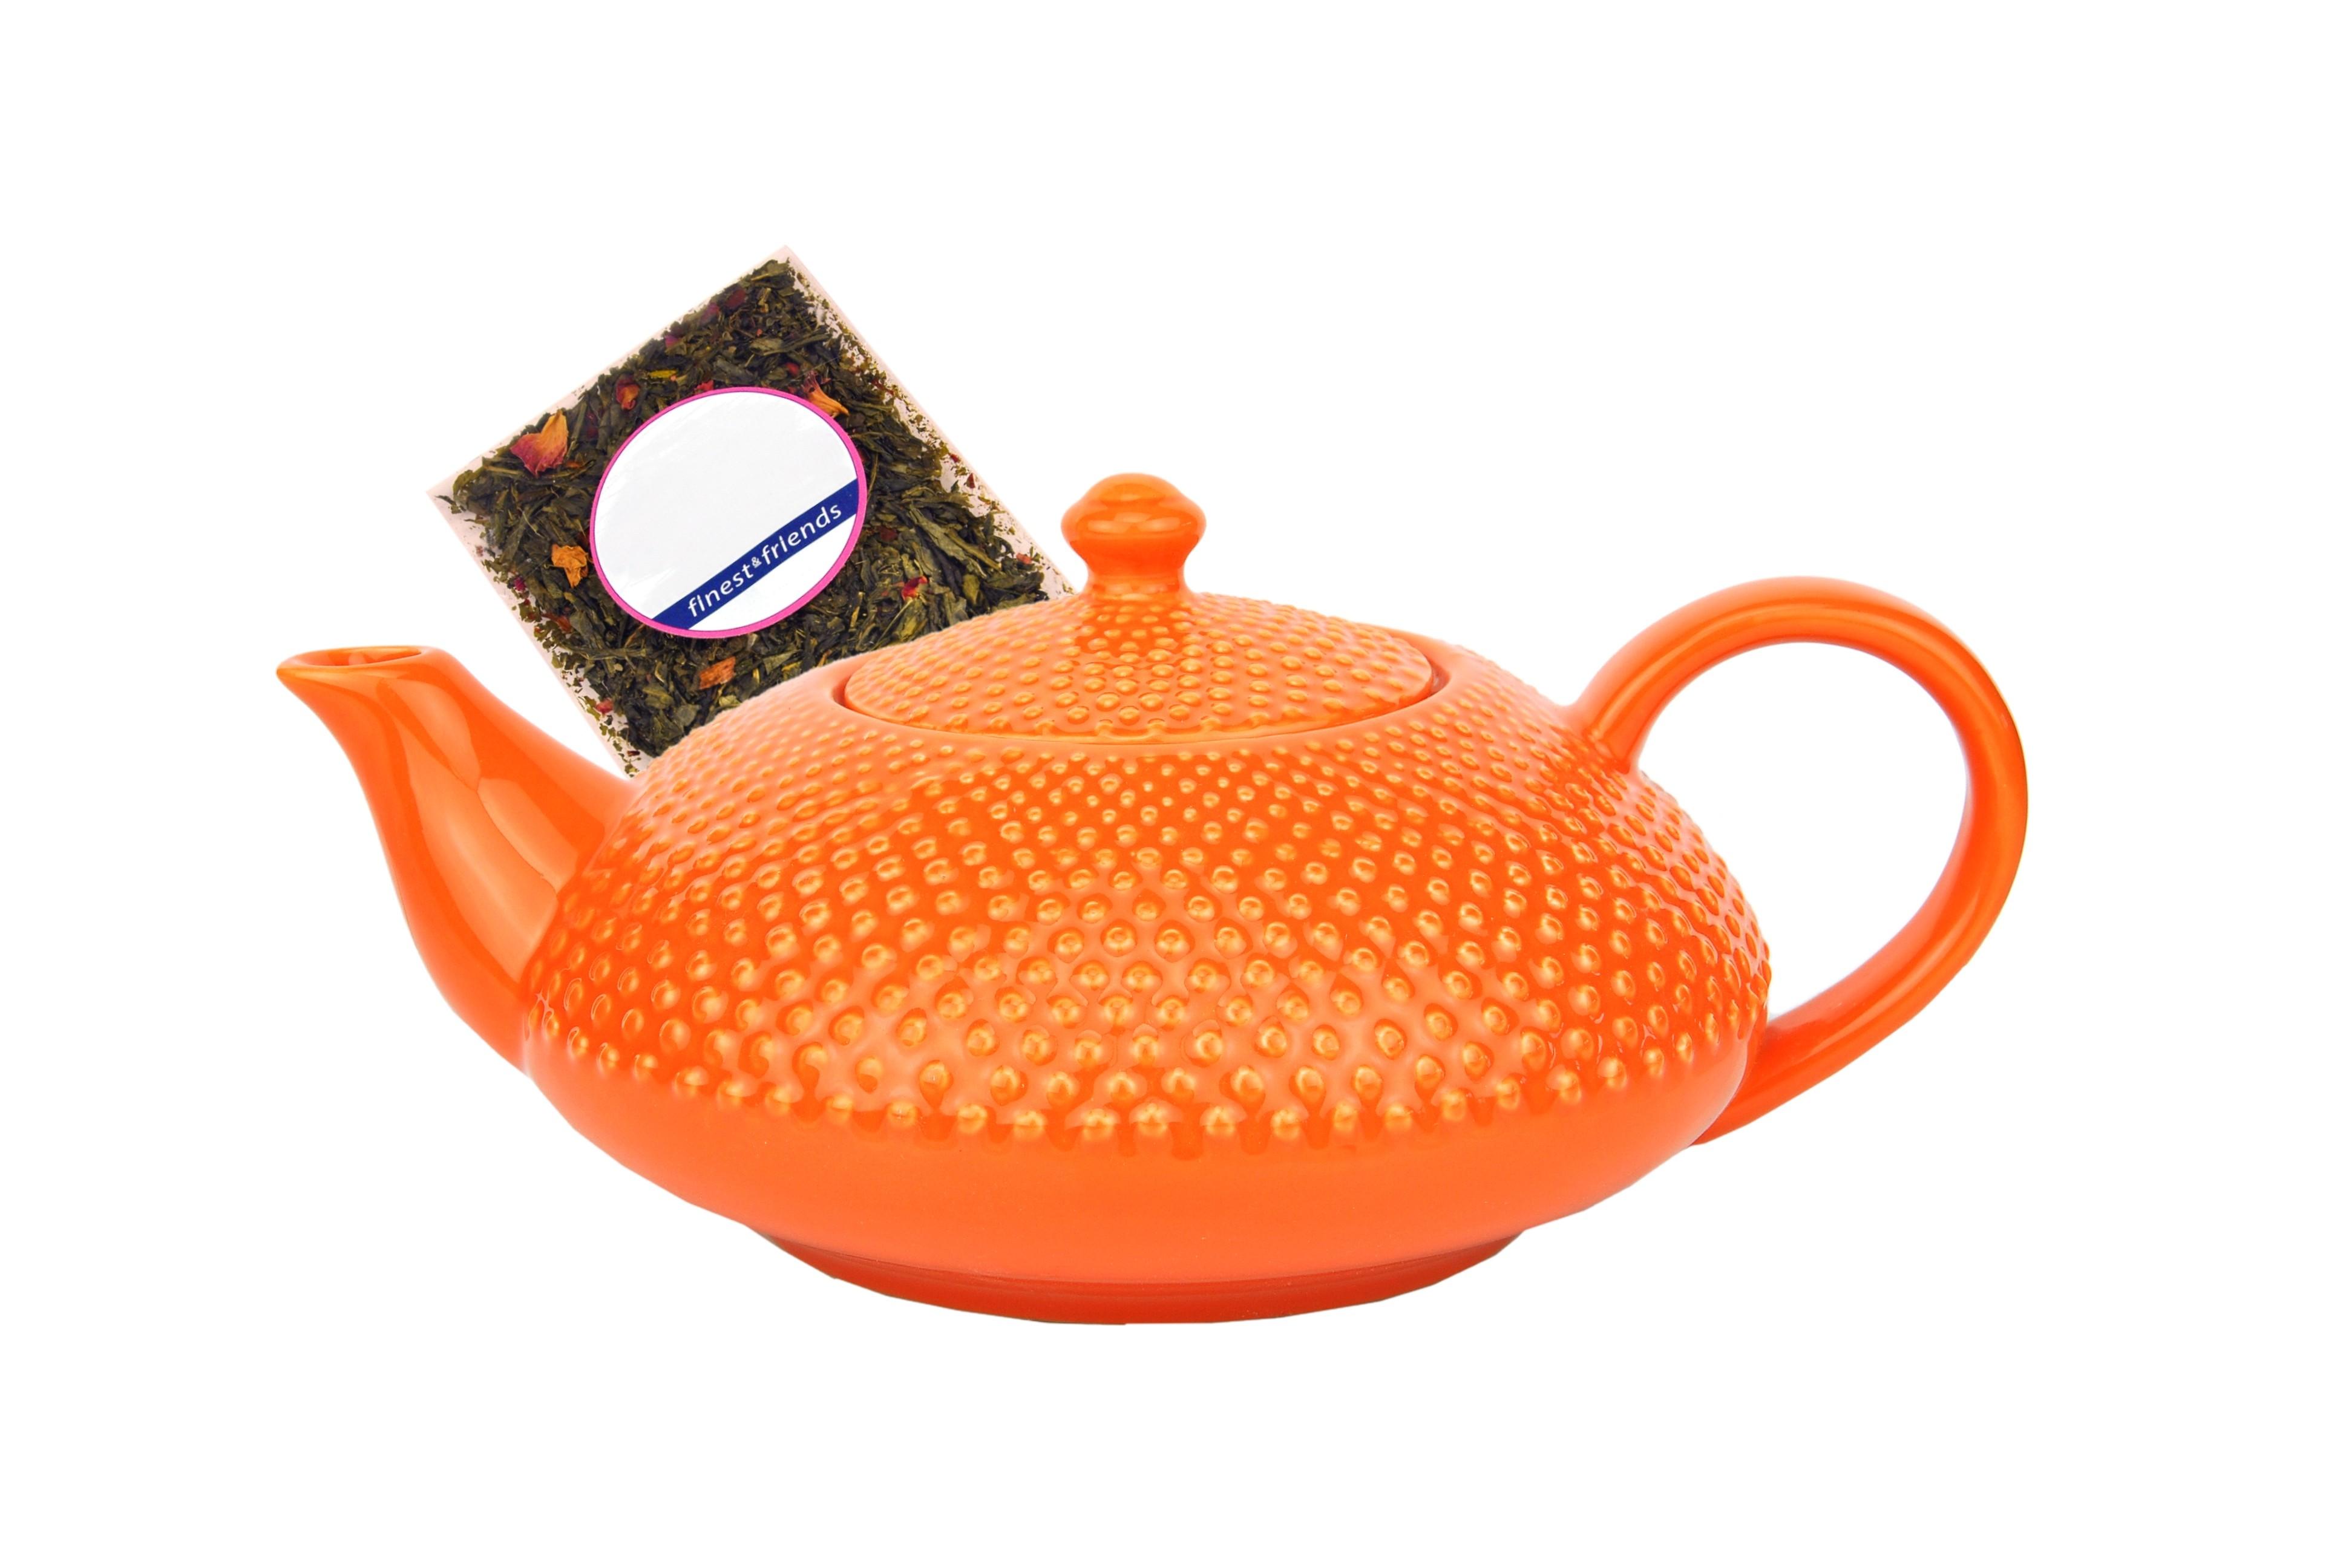 japanische teekanne keramik shikoku 0 75l orange jameson tailor 3690 teeprobe porzellan. Black Bedroom Furniture Sets. Home Design Ideas